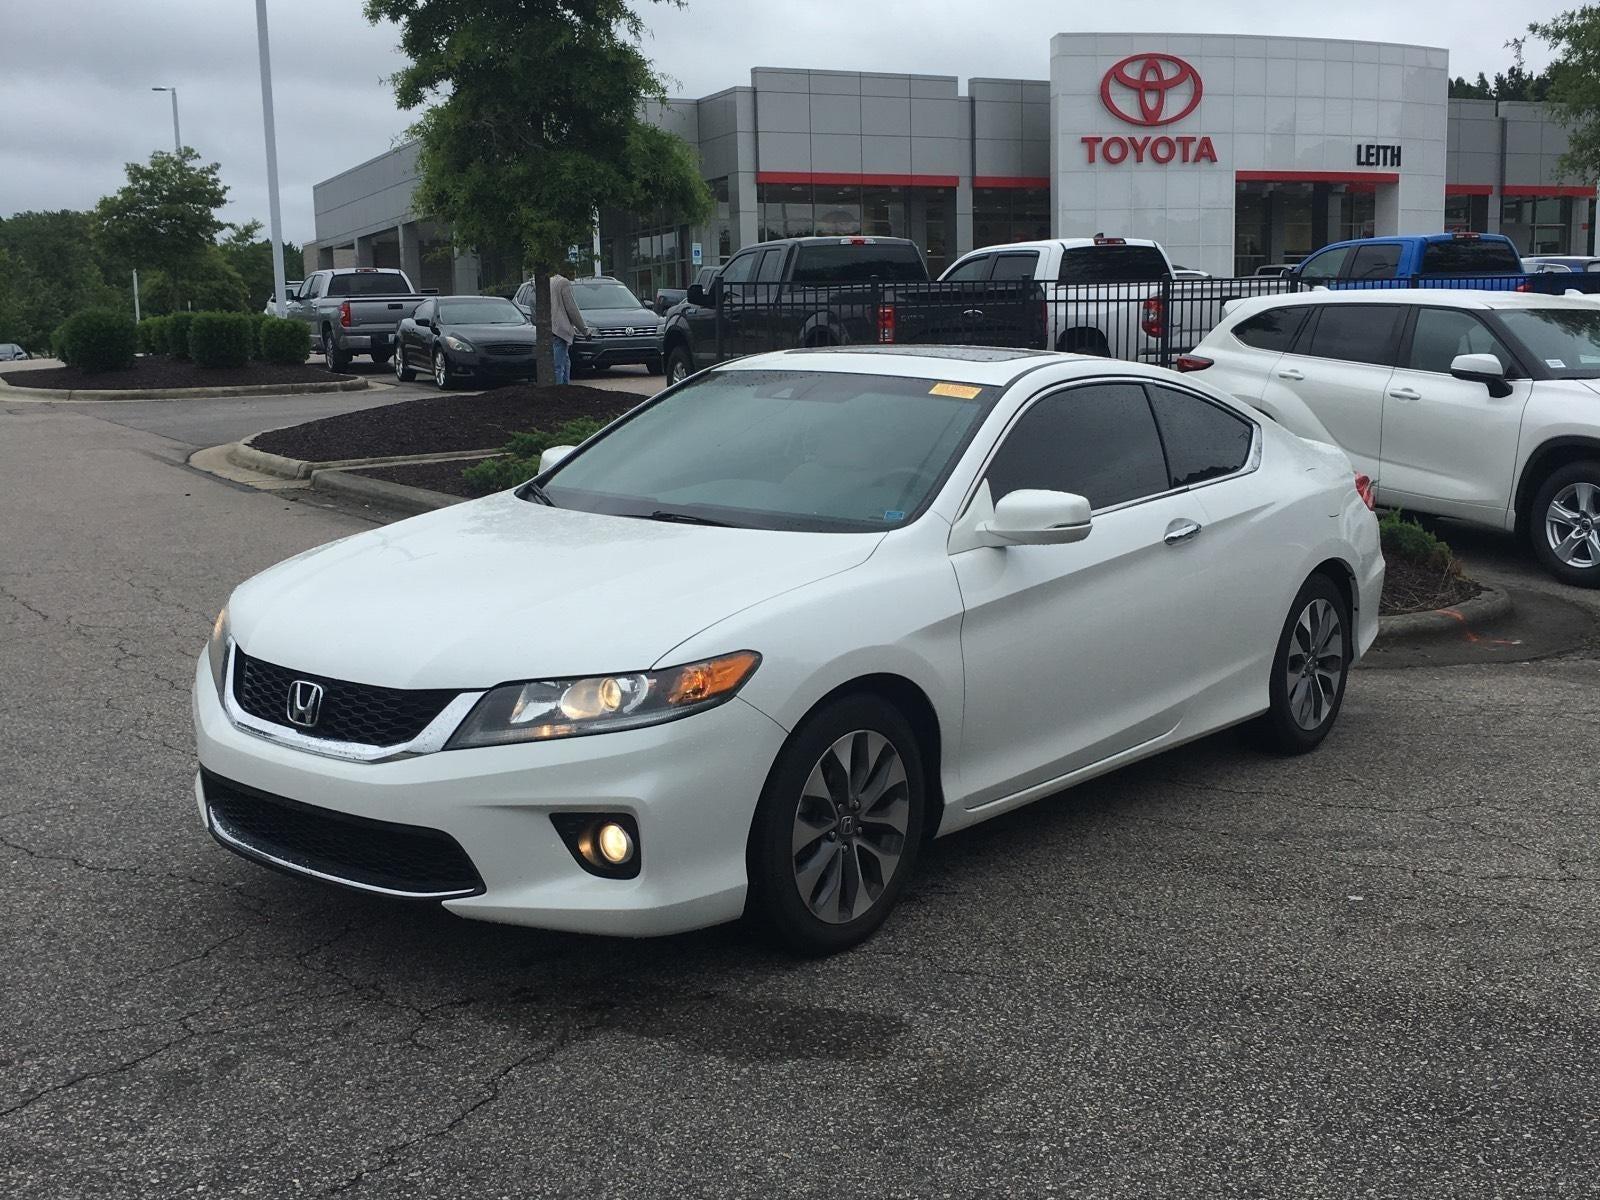 Honda Accord Cpe Under 500 Dollars Down